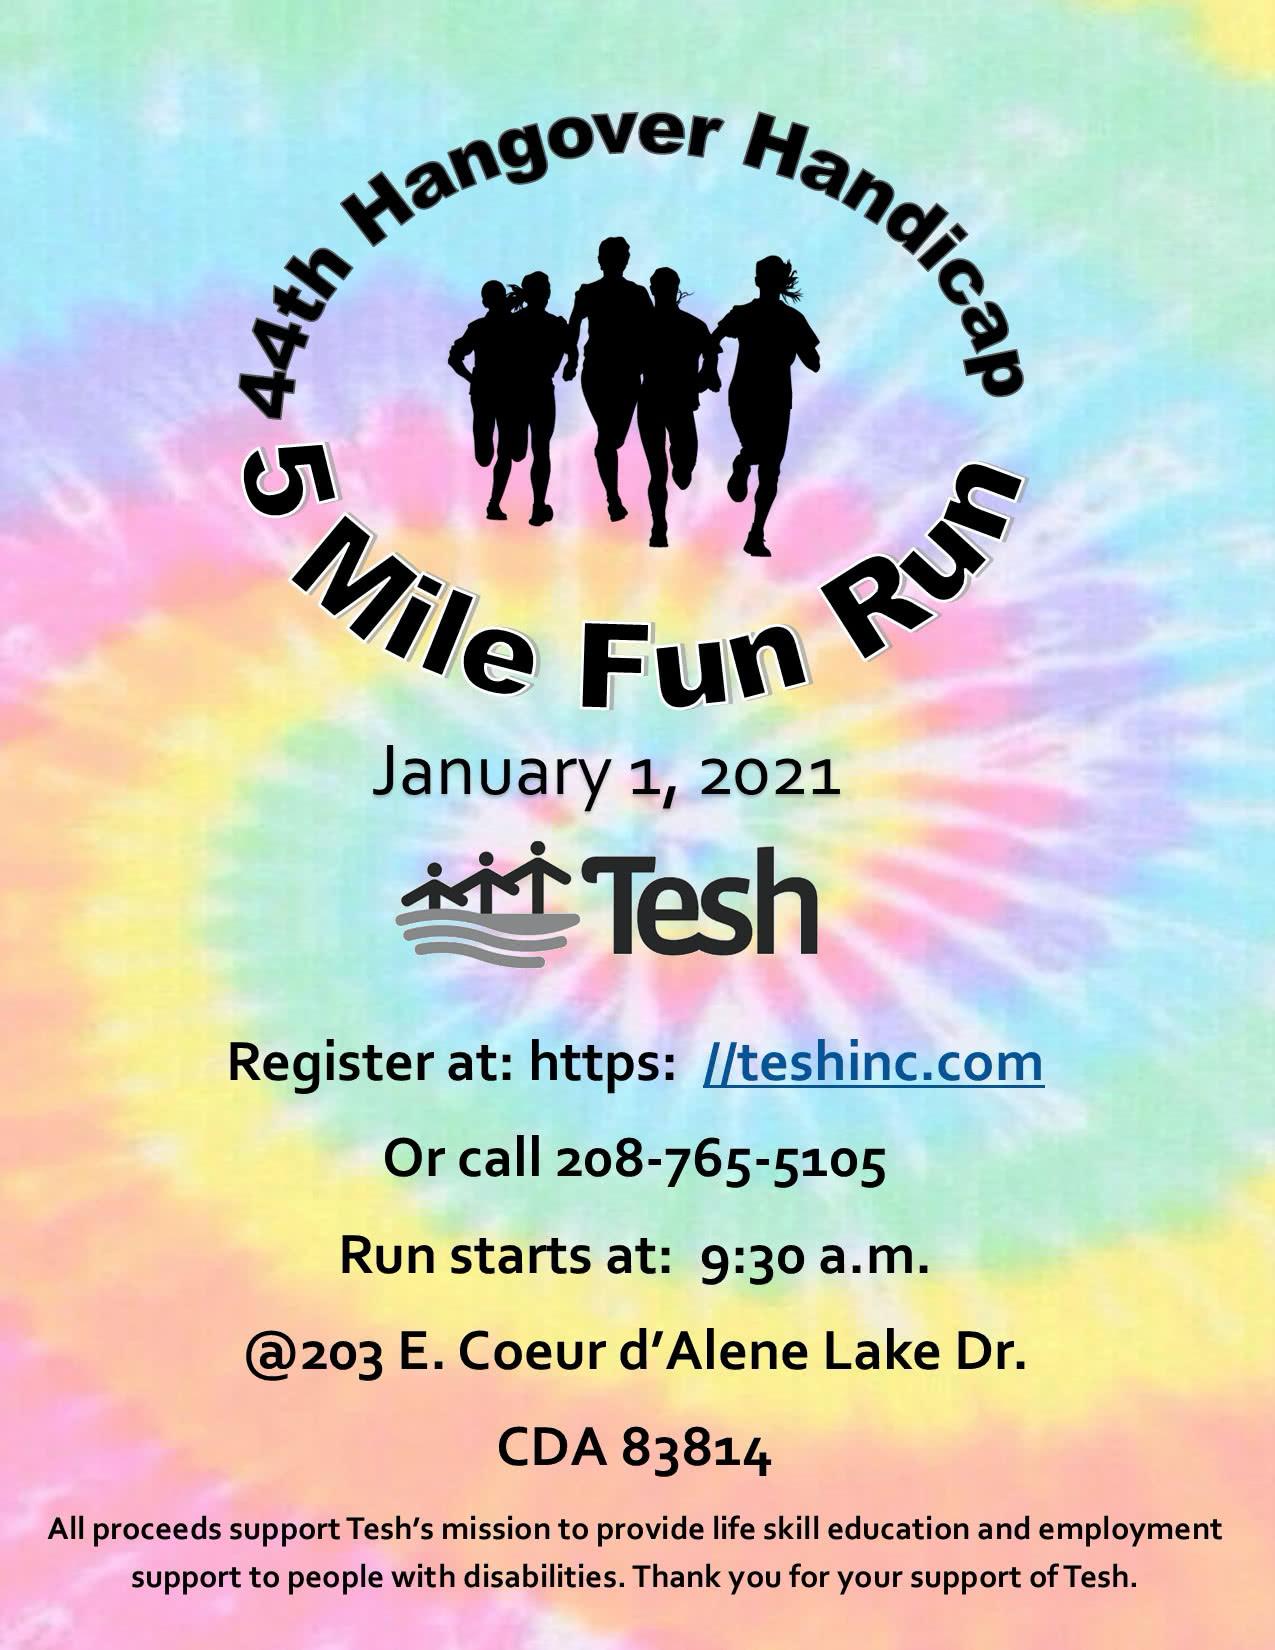 Hangover Handicap 5 Mile Run Poster 01